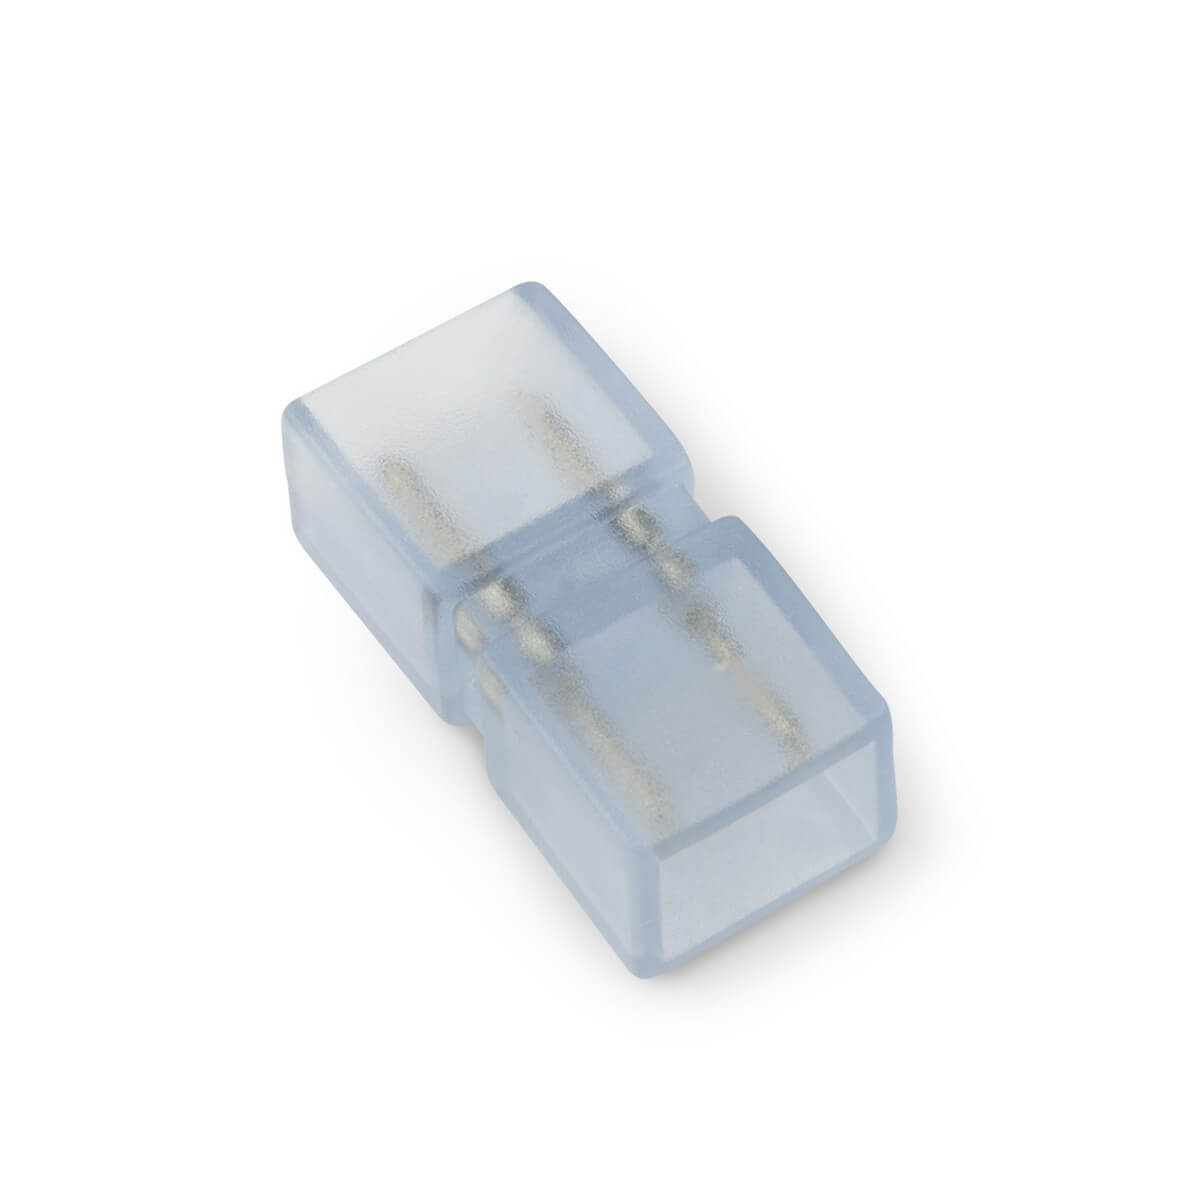 Клемма (UL-00000869) Uniel UTC-K-14/B67-RGB Clear 025 Polybag стоимость